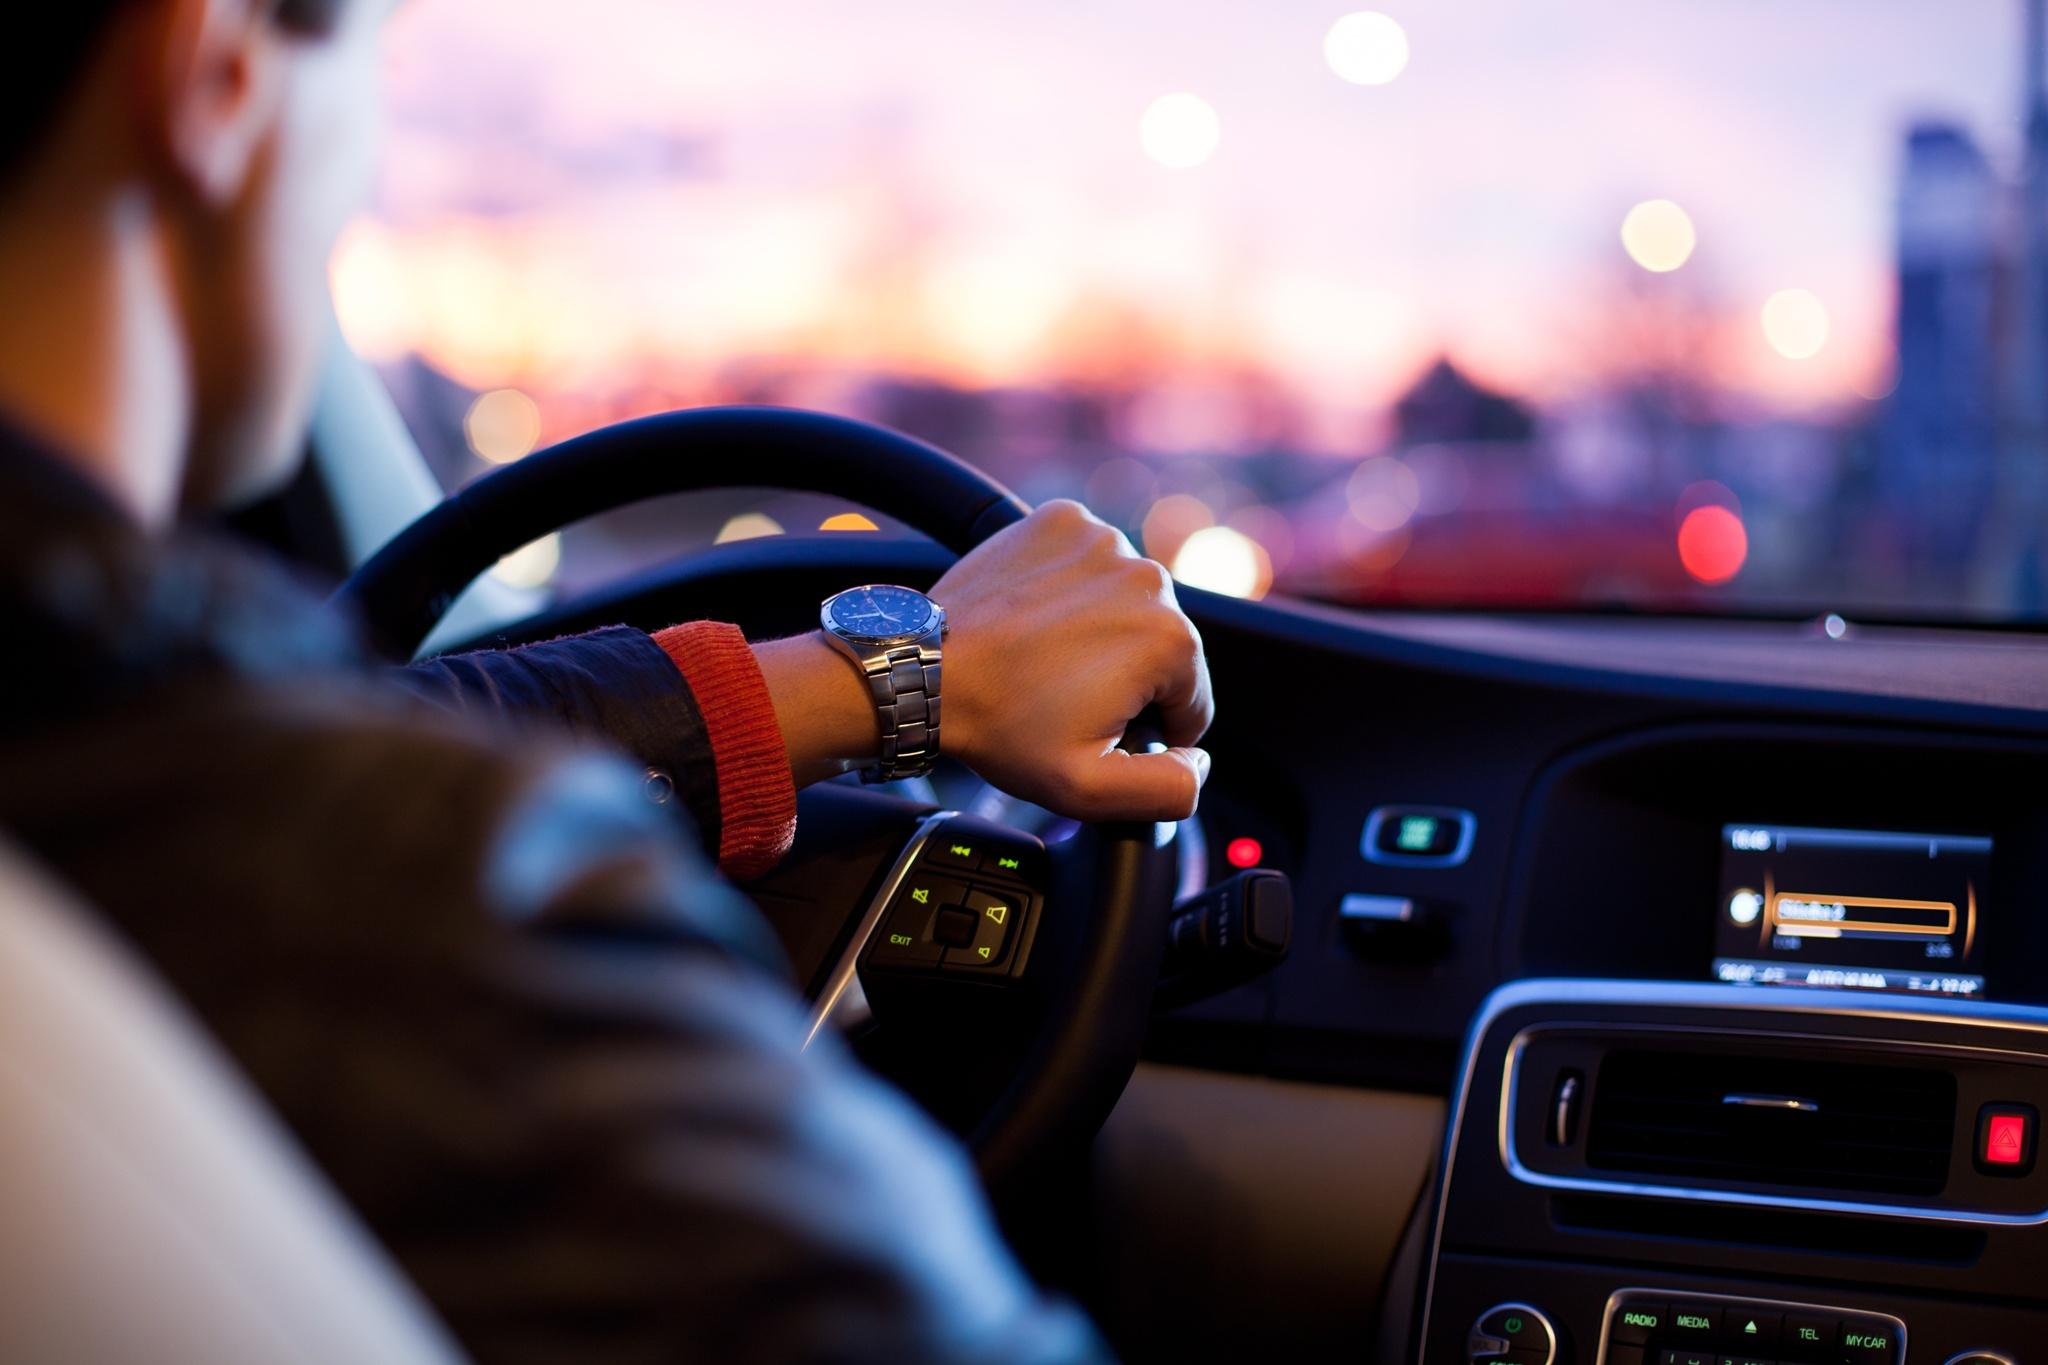 galite vairuoti automobilį su hipertenzija labas rytas amerika sirdies sveikata